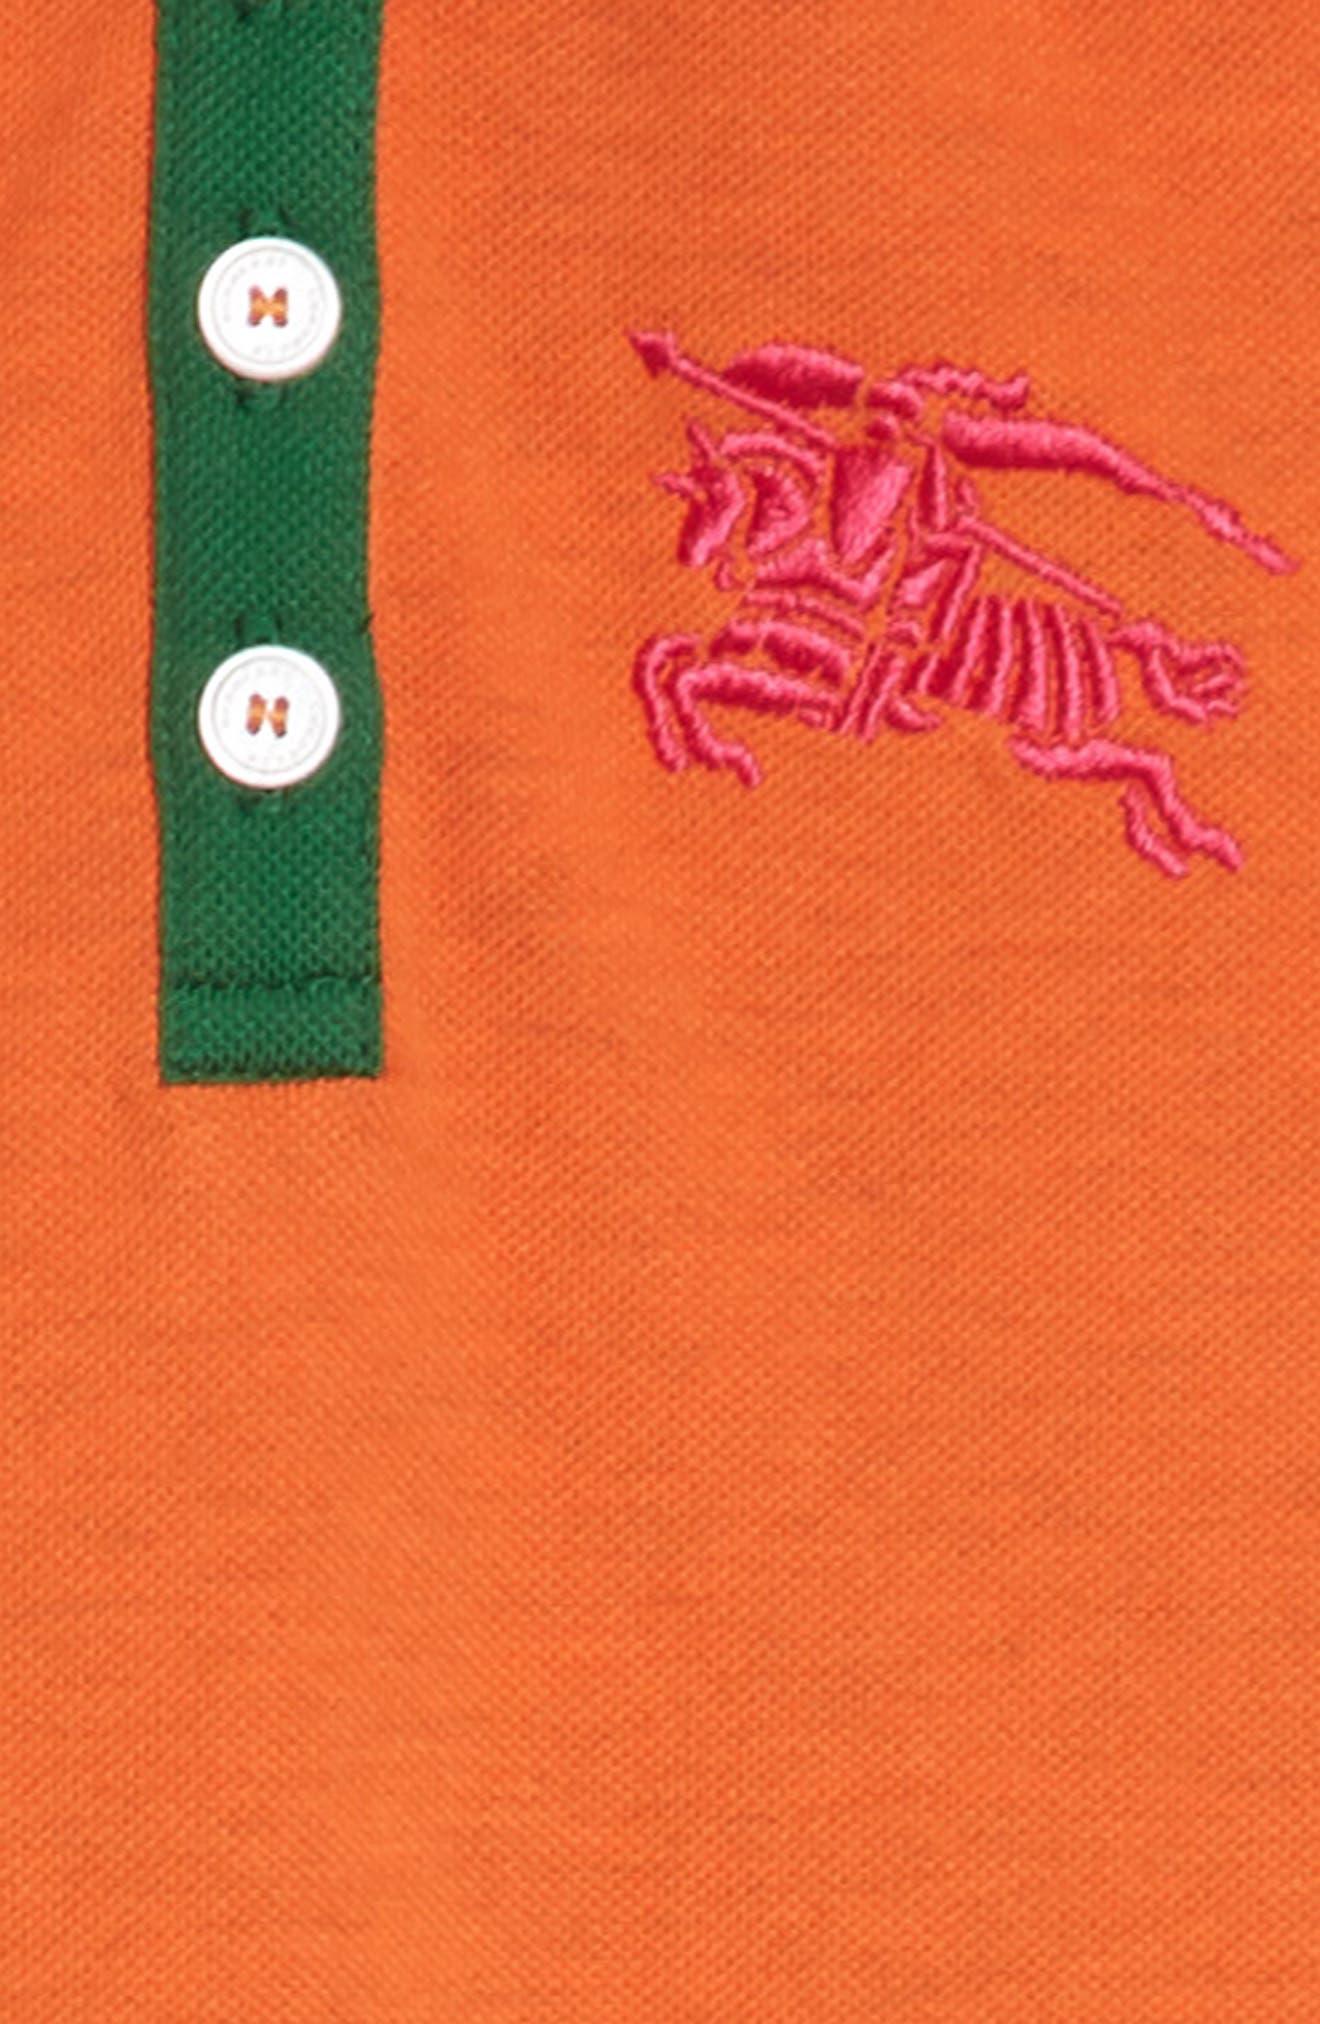 Burbery Cali Polo Dress,                             Alternate thumbnail 3, color,                             Brt Clementine Mel